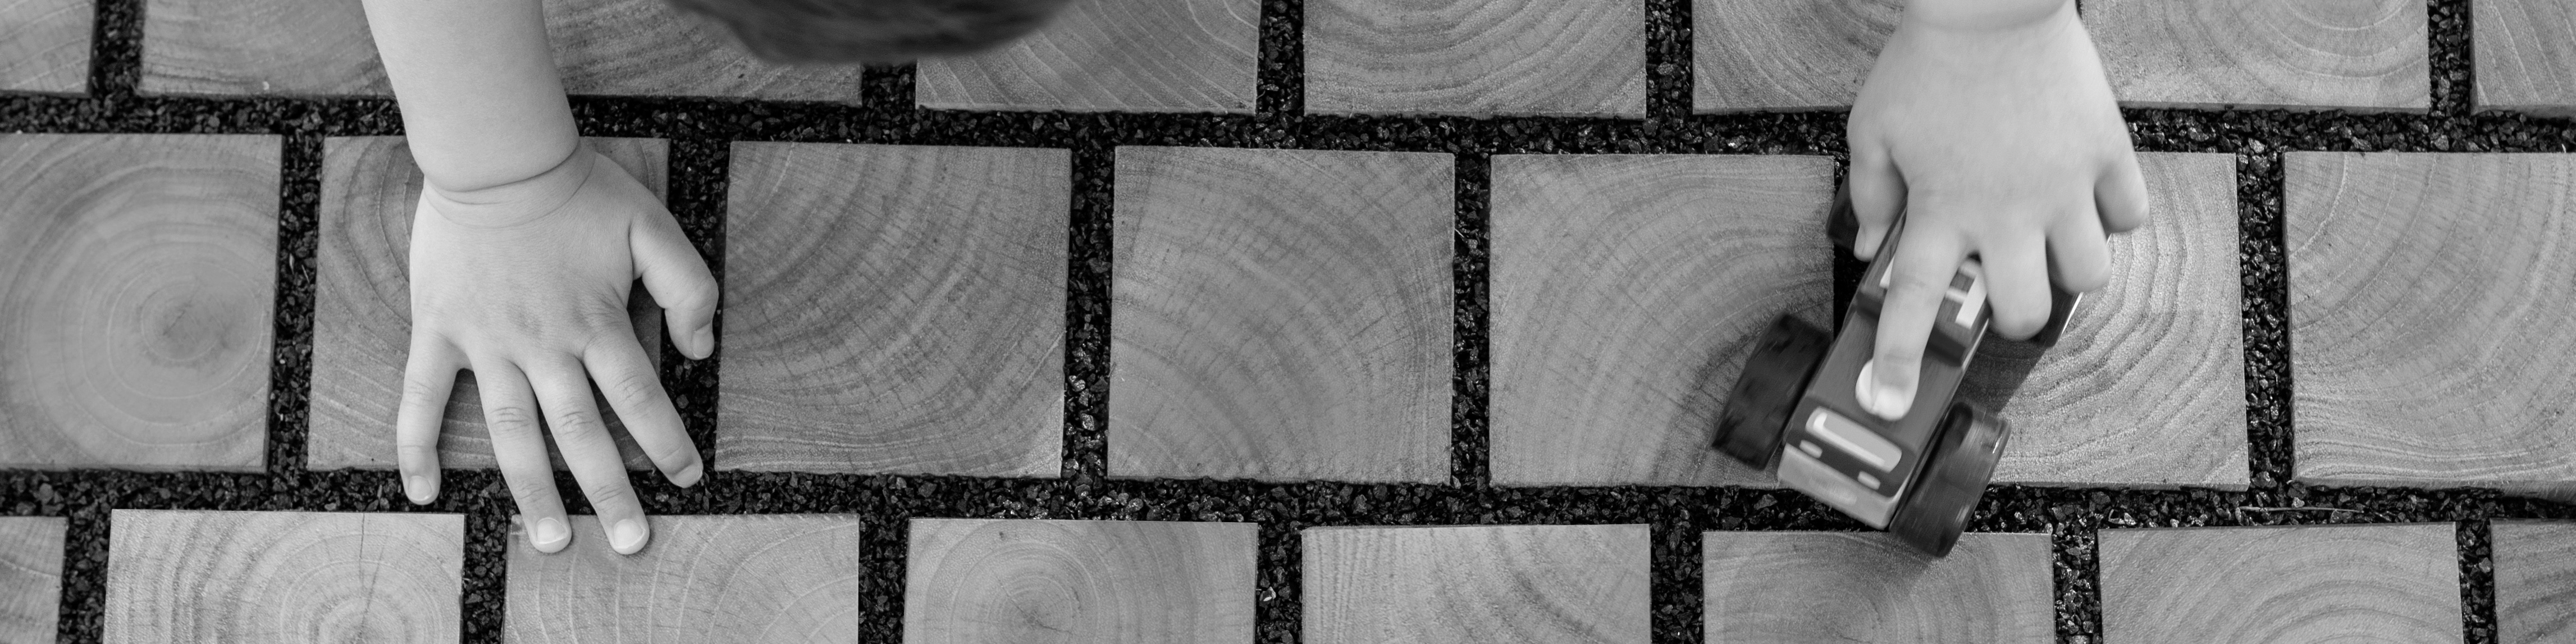 Holz Produkte